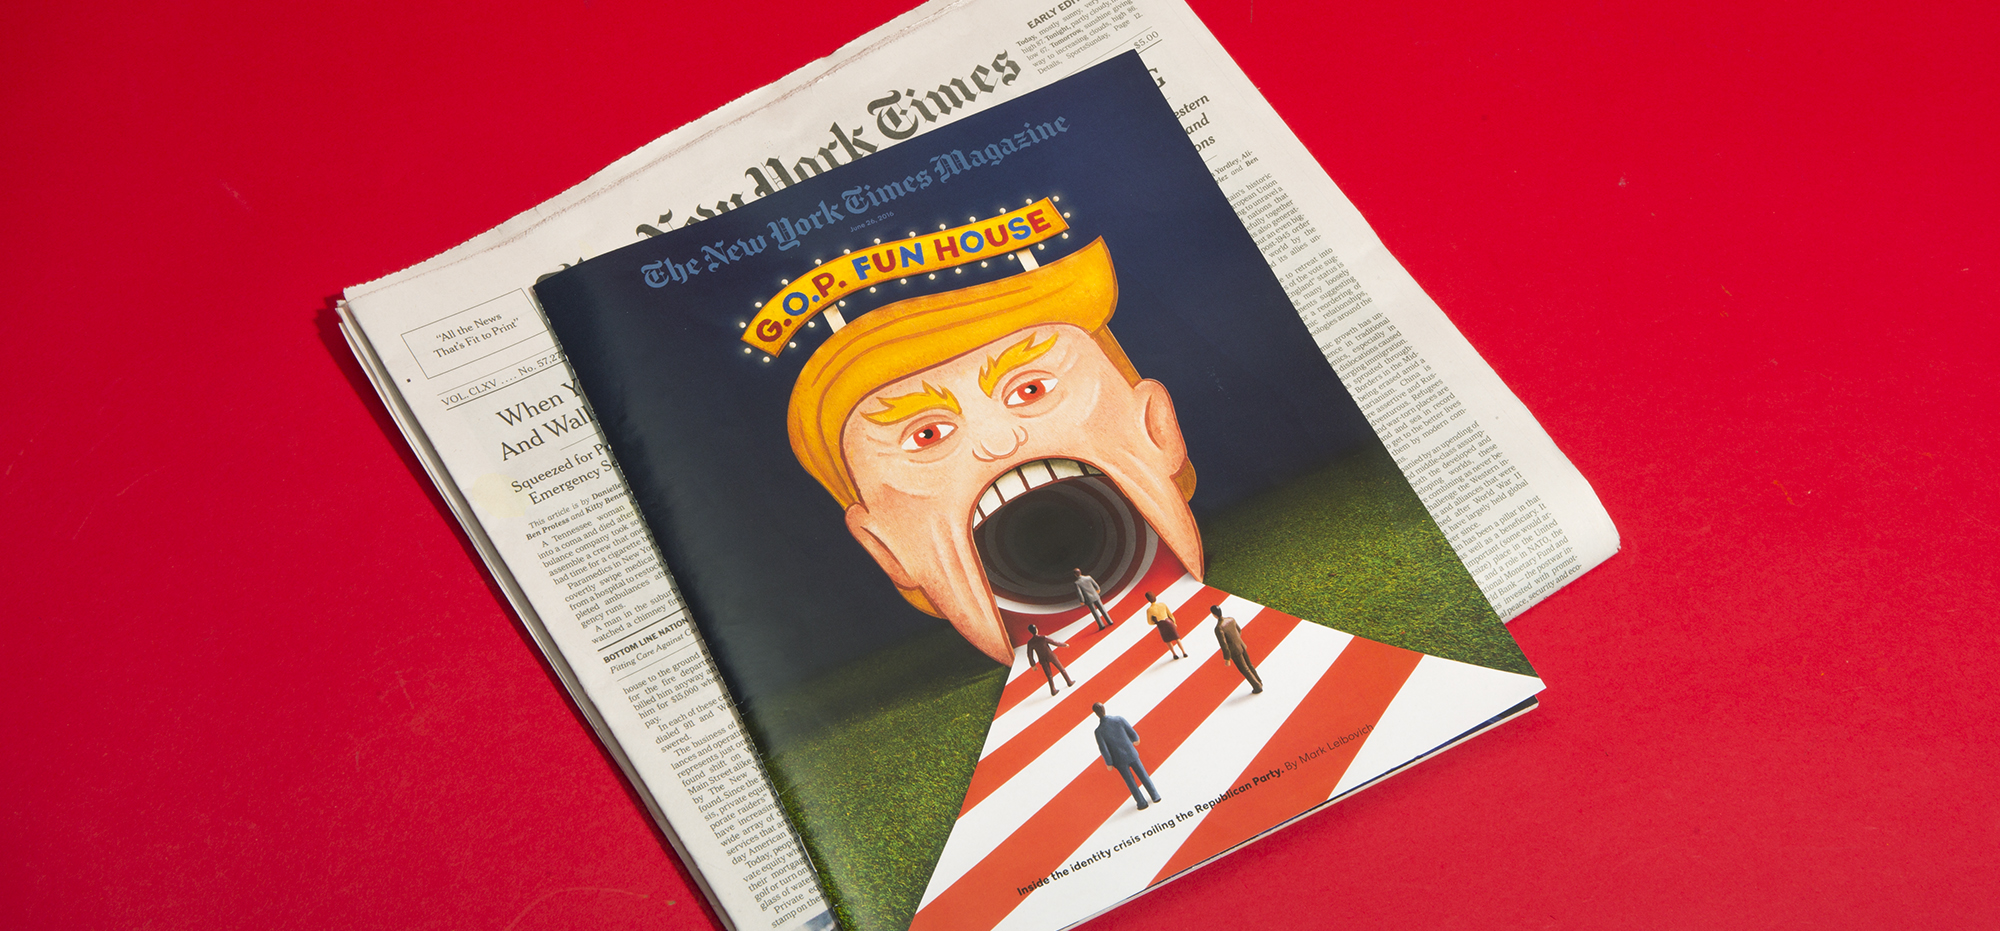 New York Times – G.O.P.